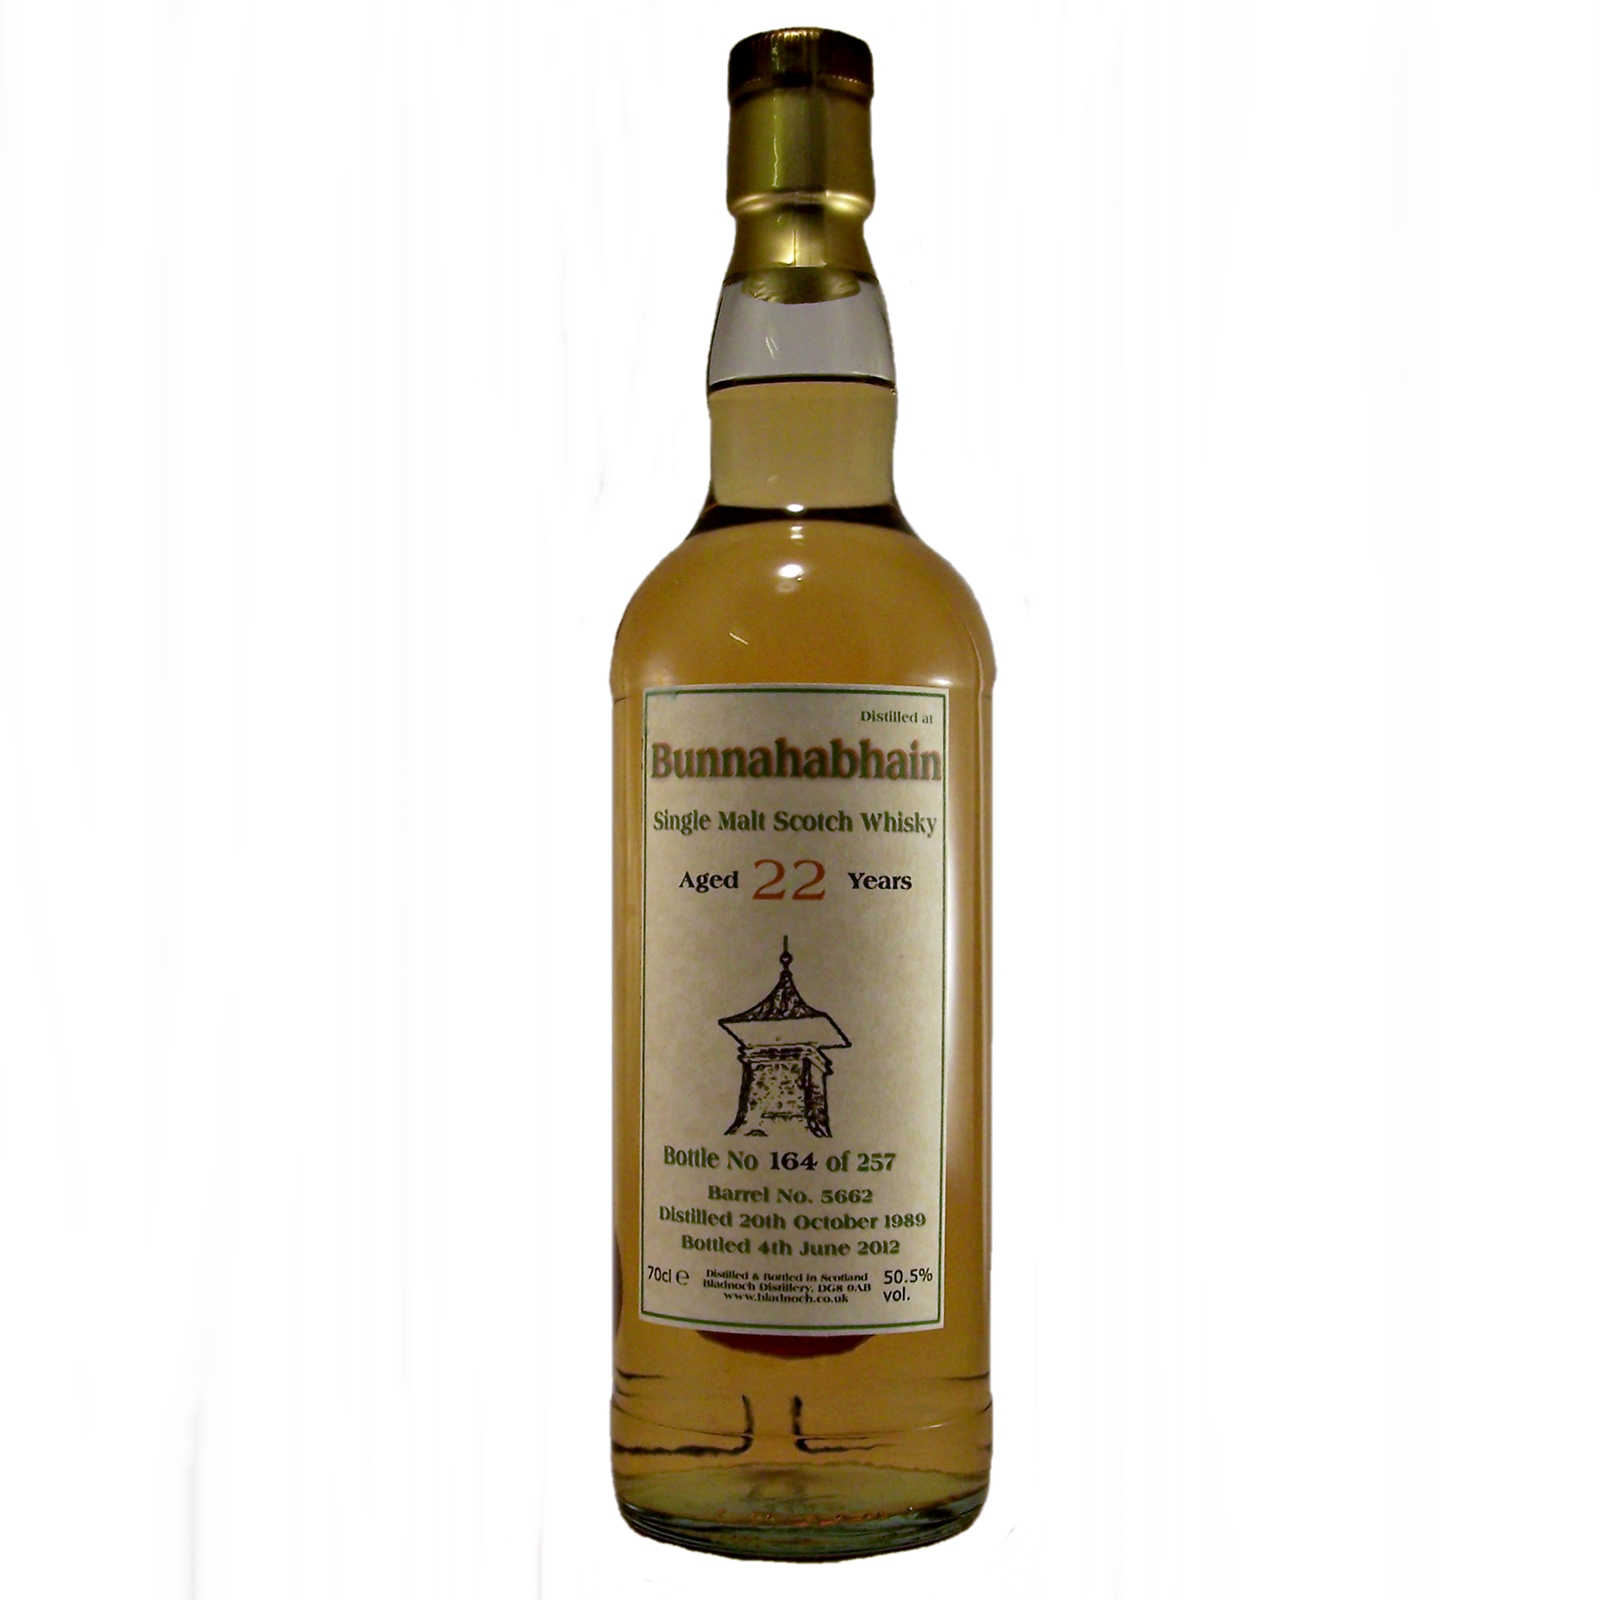 Definere enkelt malt scotch